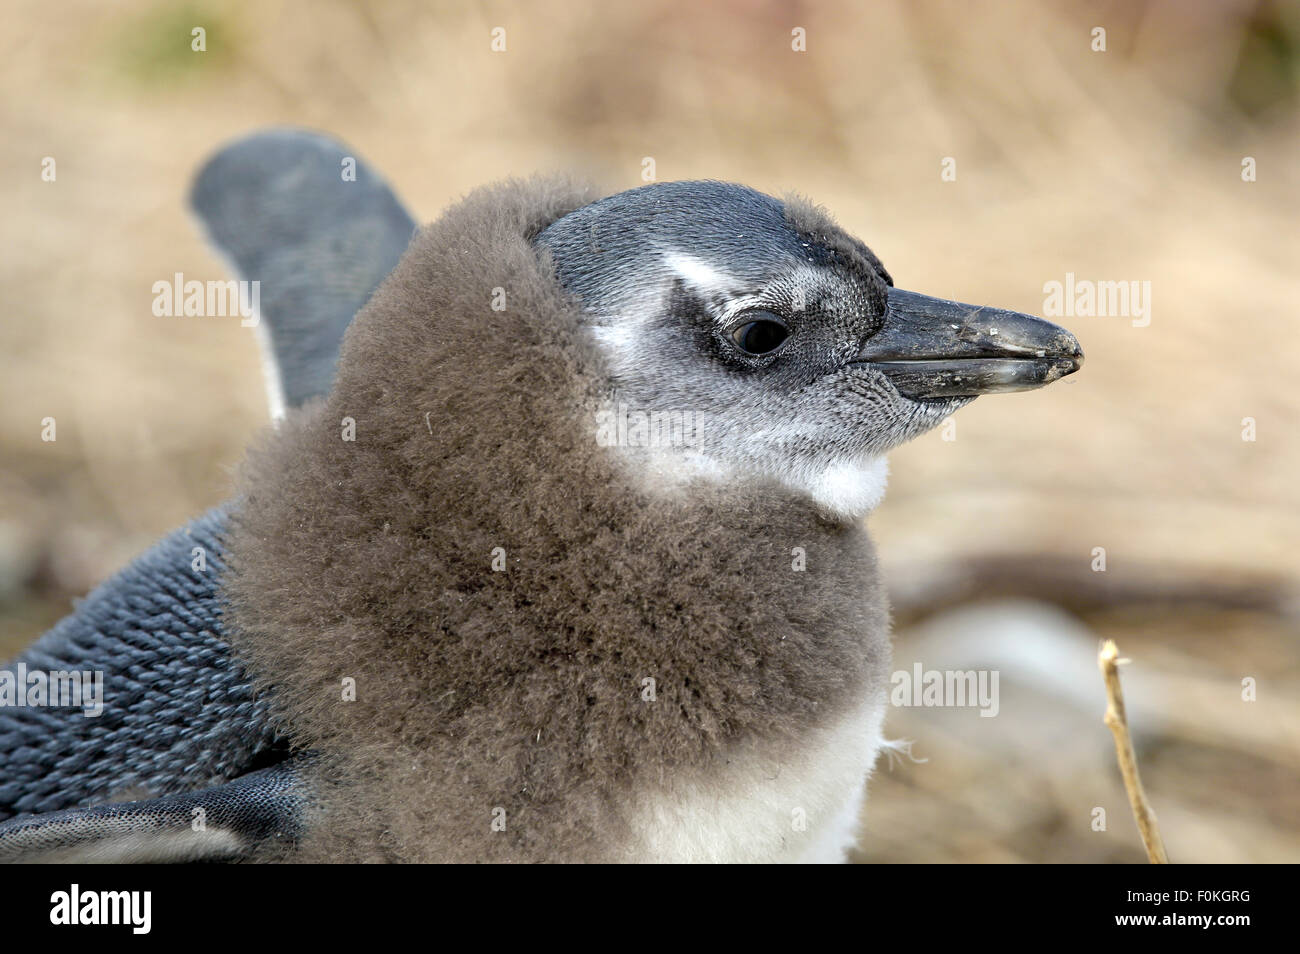 African penguin (Spheniscus demersus) chick malting - Stock Image